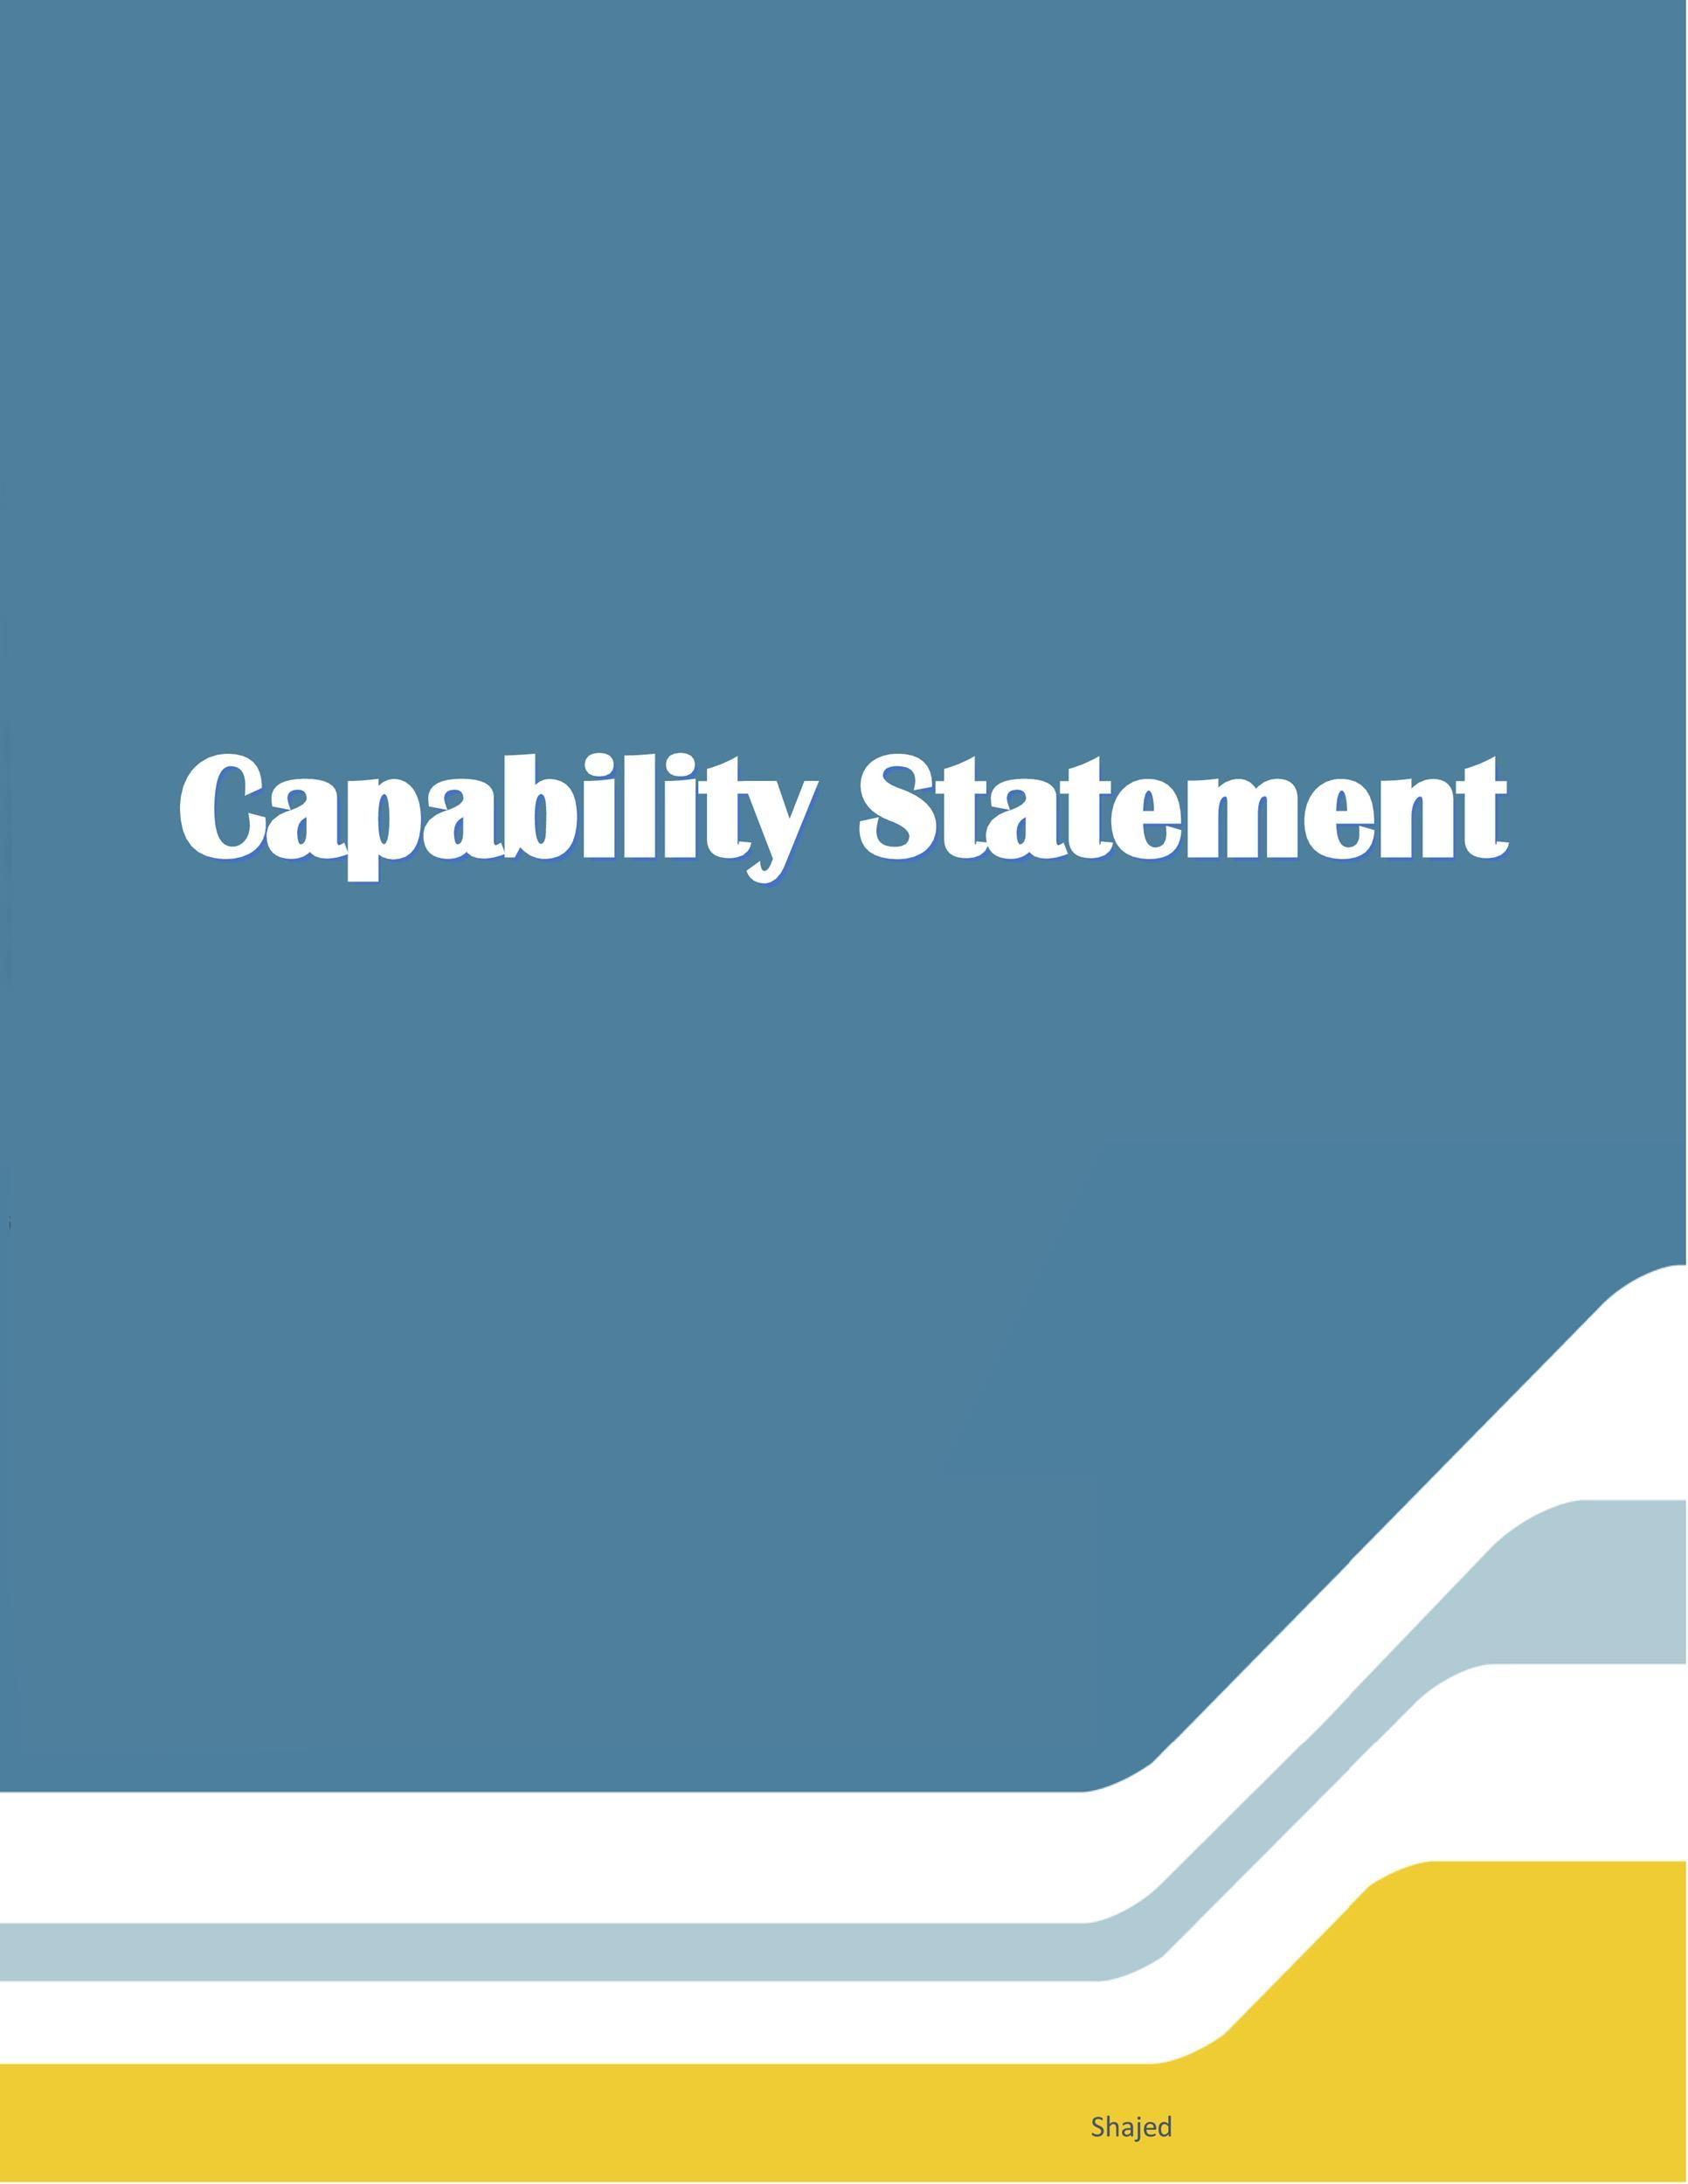 Free capability statement 07